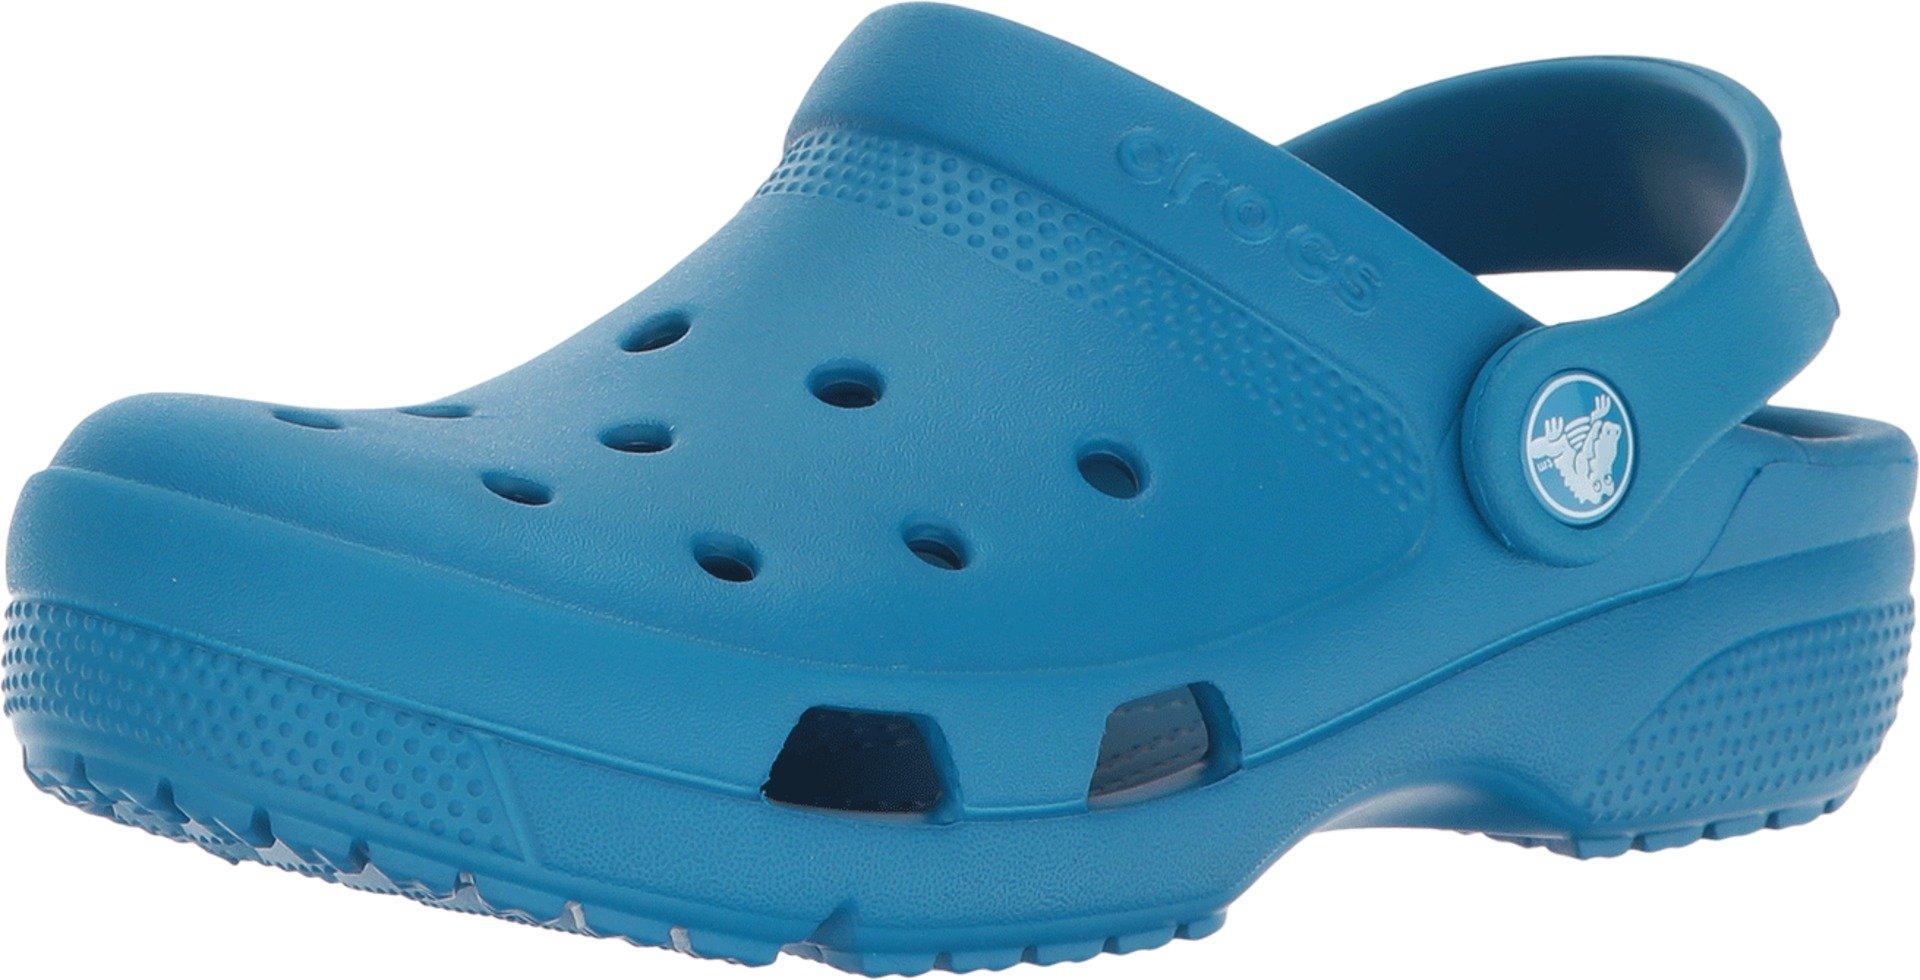 Crocs Kids Unisex Coast Clog (Toddler/Little Kid) Ultramarine 10 M US Toddler